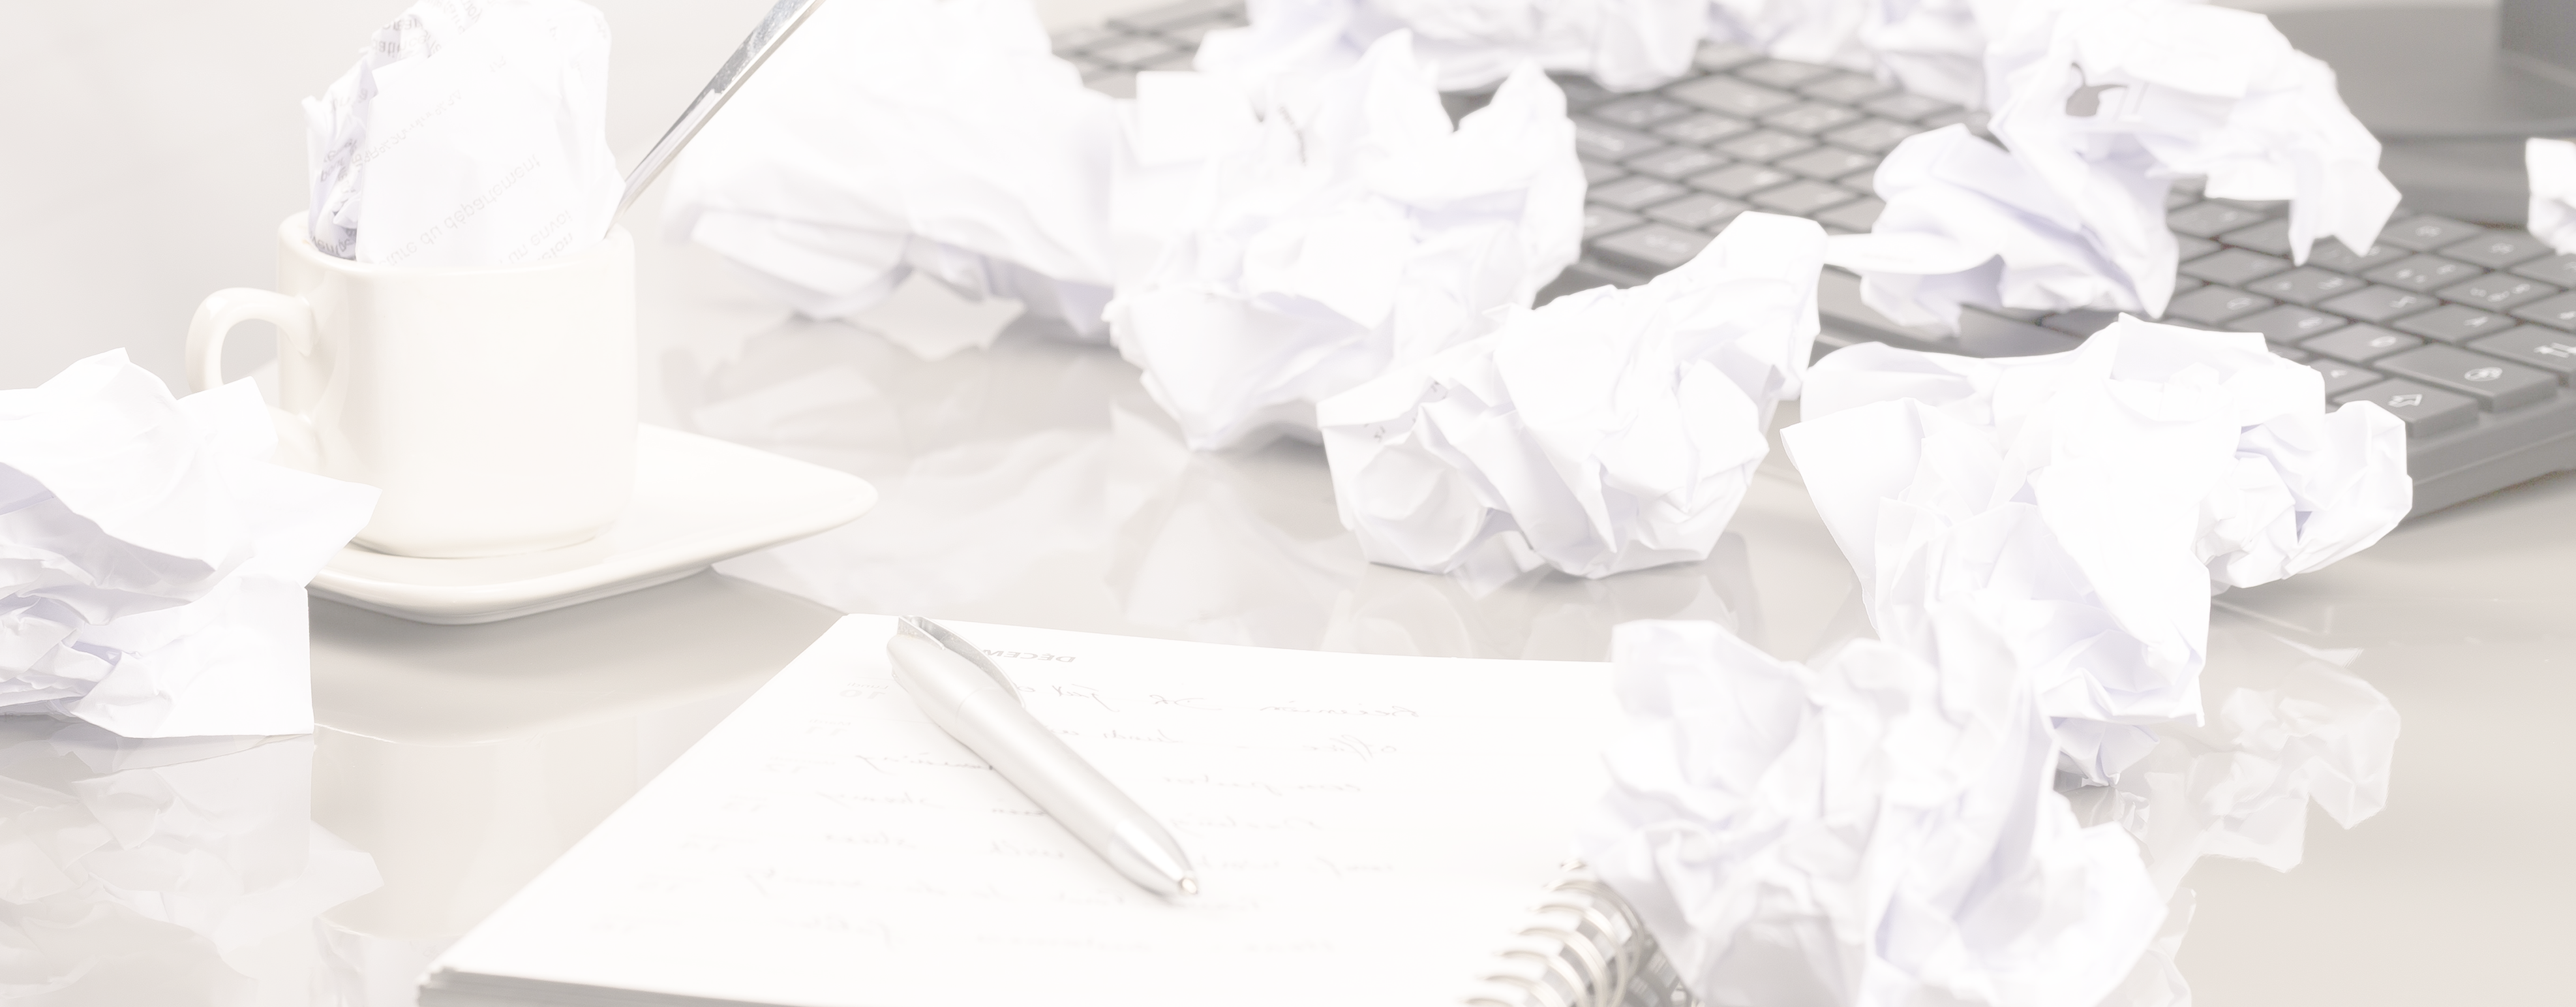 crumpled paper • Joy Bennett Consulting